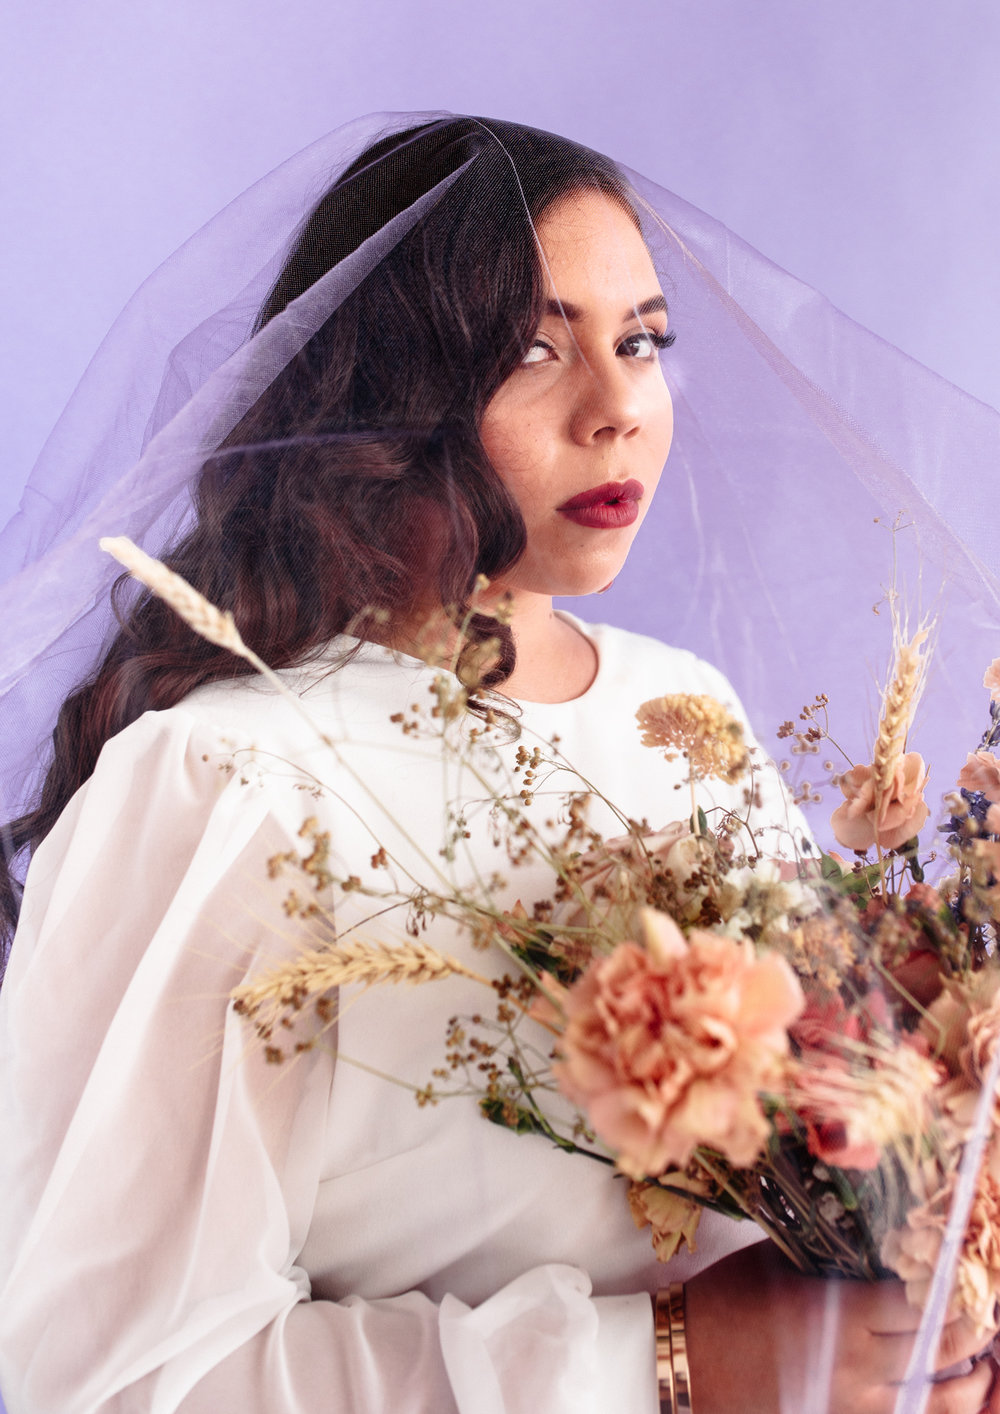 SamErica Studios - Lavender Lemonade Modern Bridal Editorial -45.jpg